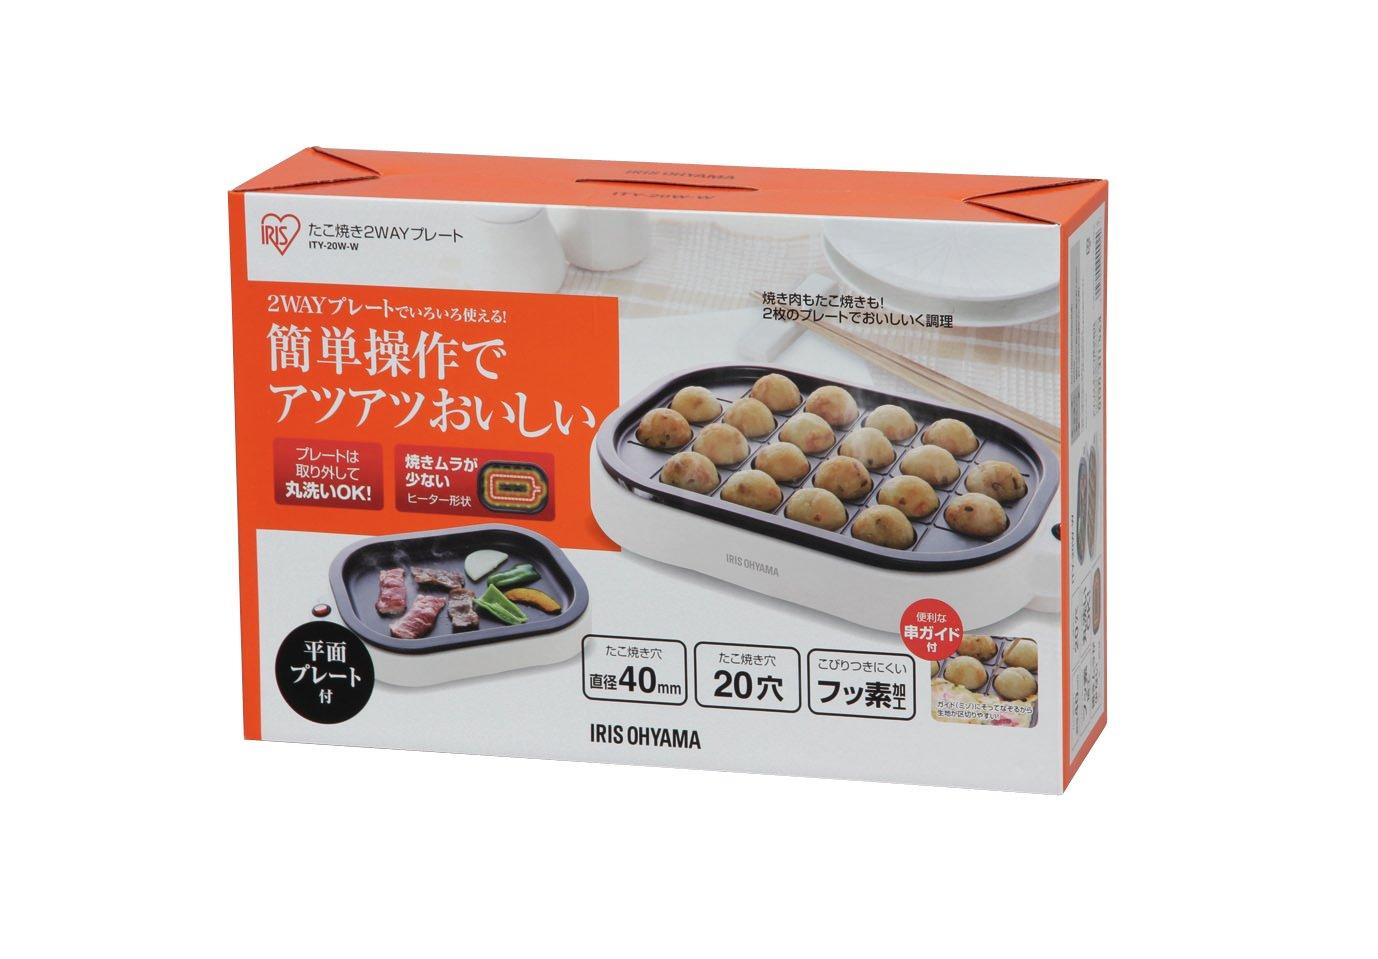 Japan Import Ball Shaped Japanese Cooker Takoyaki Red Grill from Iris Ohyama